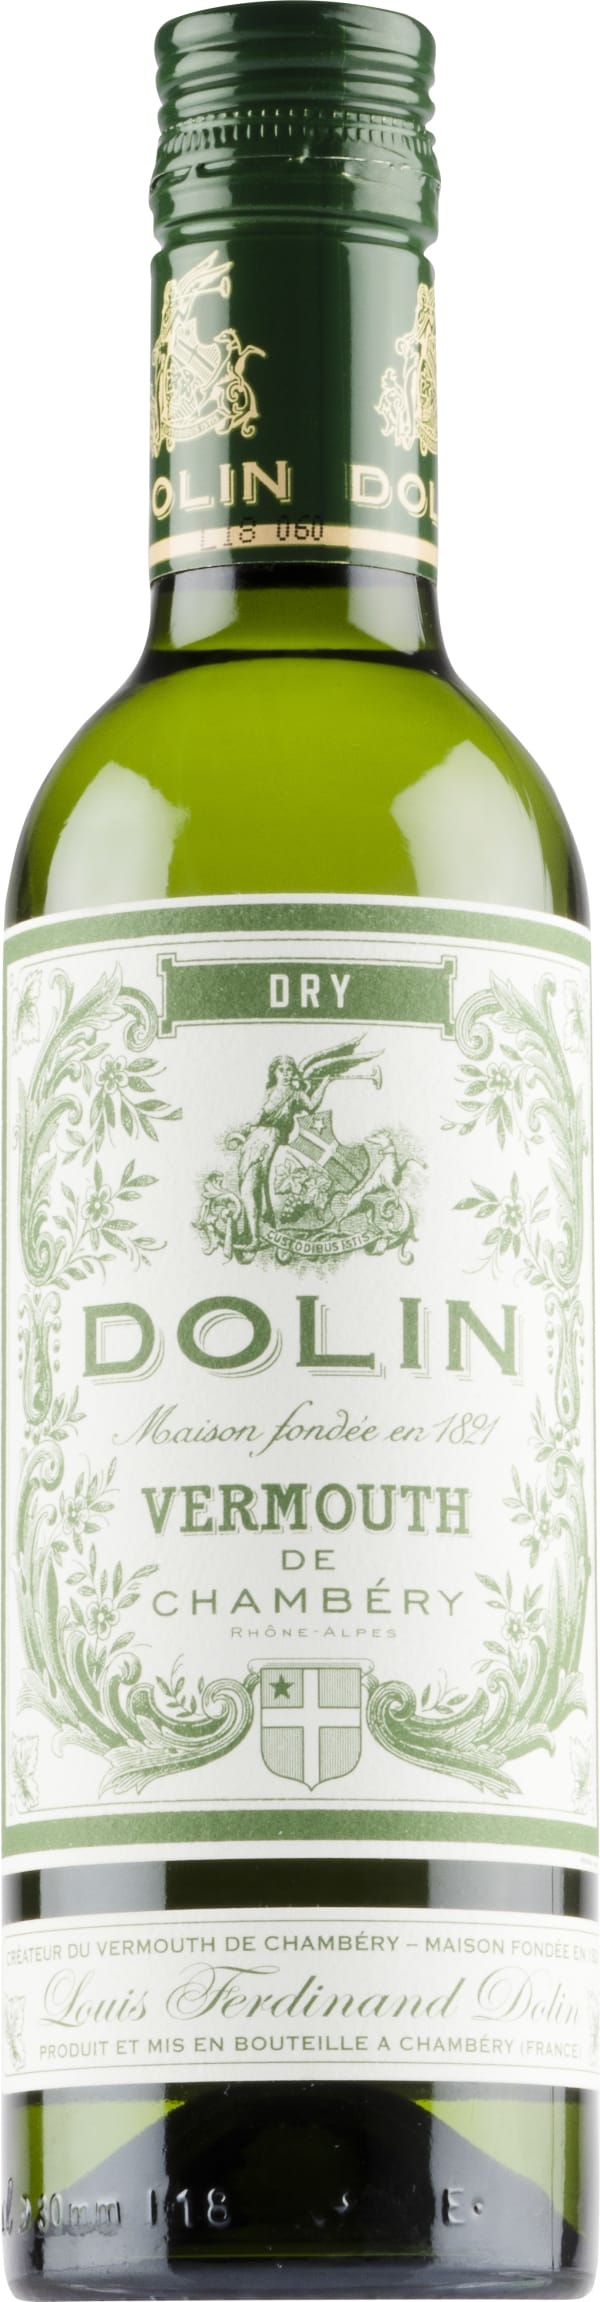 Dolin Vermouth de Chambéry Dry